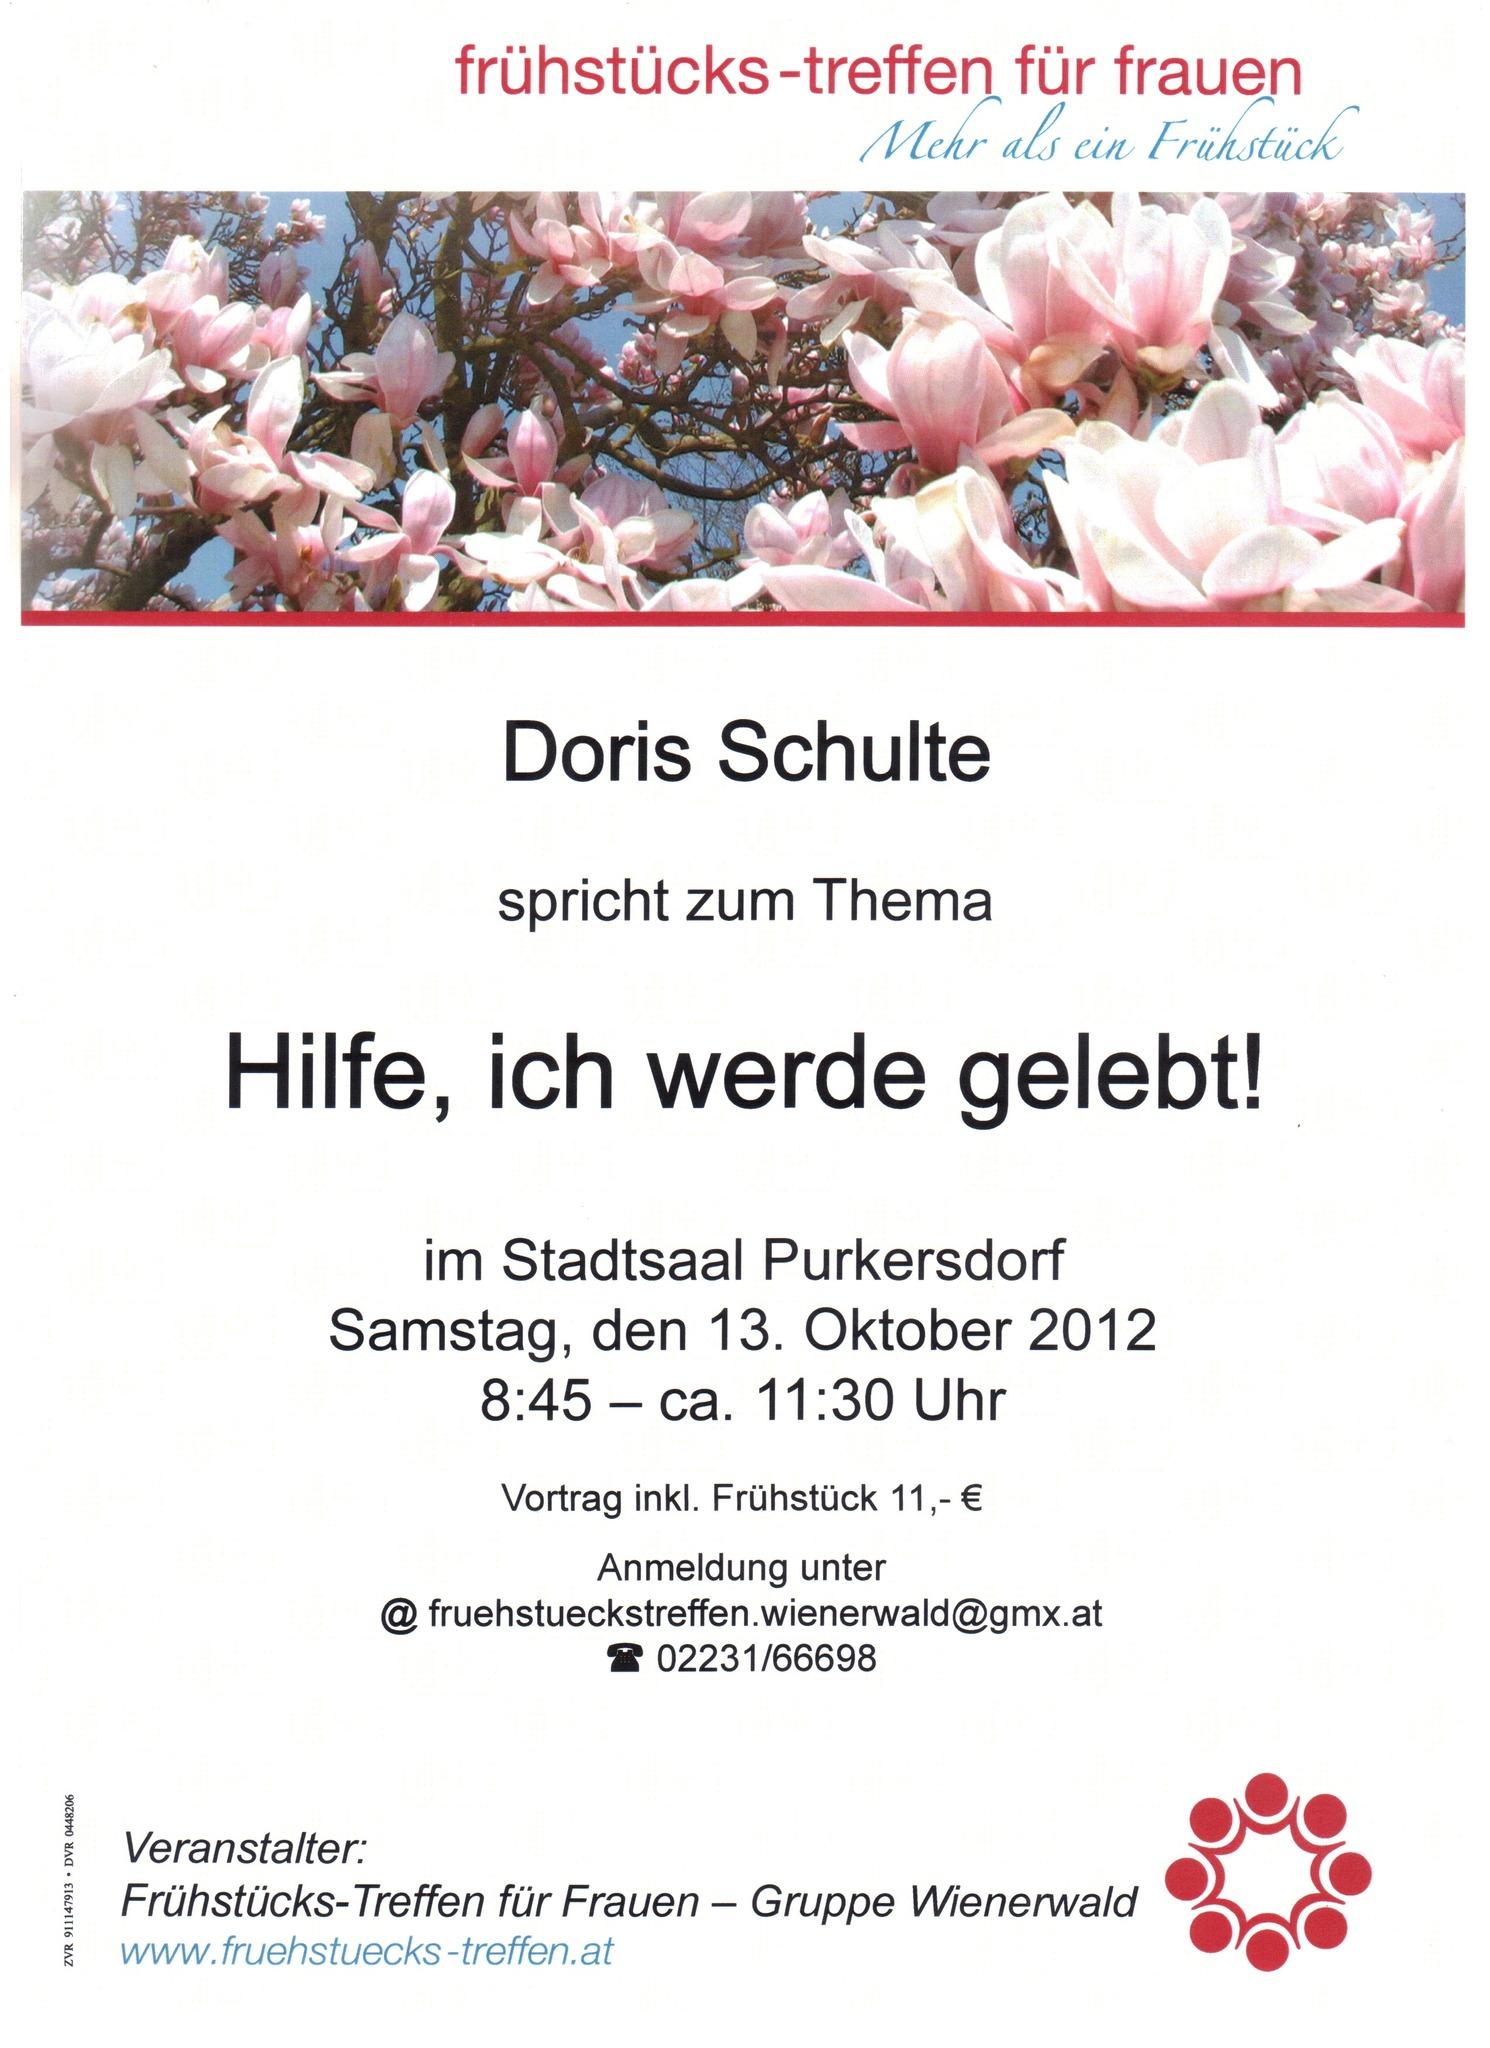 frhstcks-treffen fr Frauen - Purkersdorf - blaklimos.com